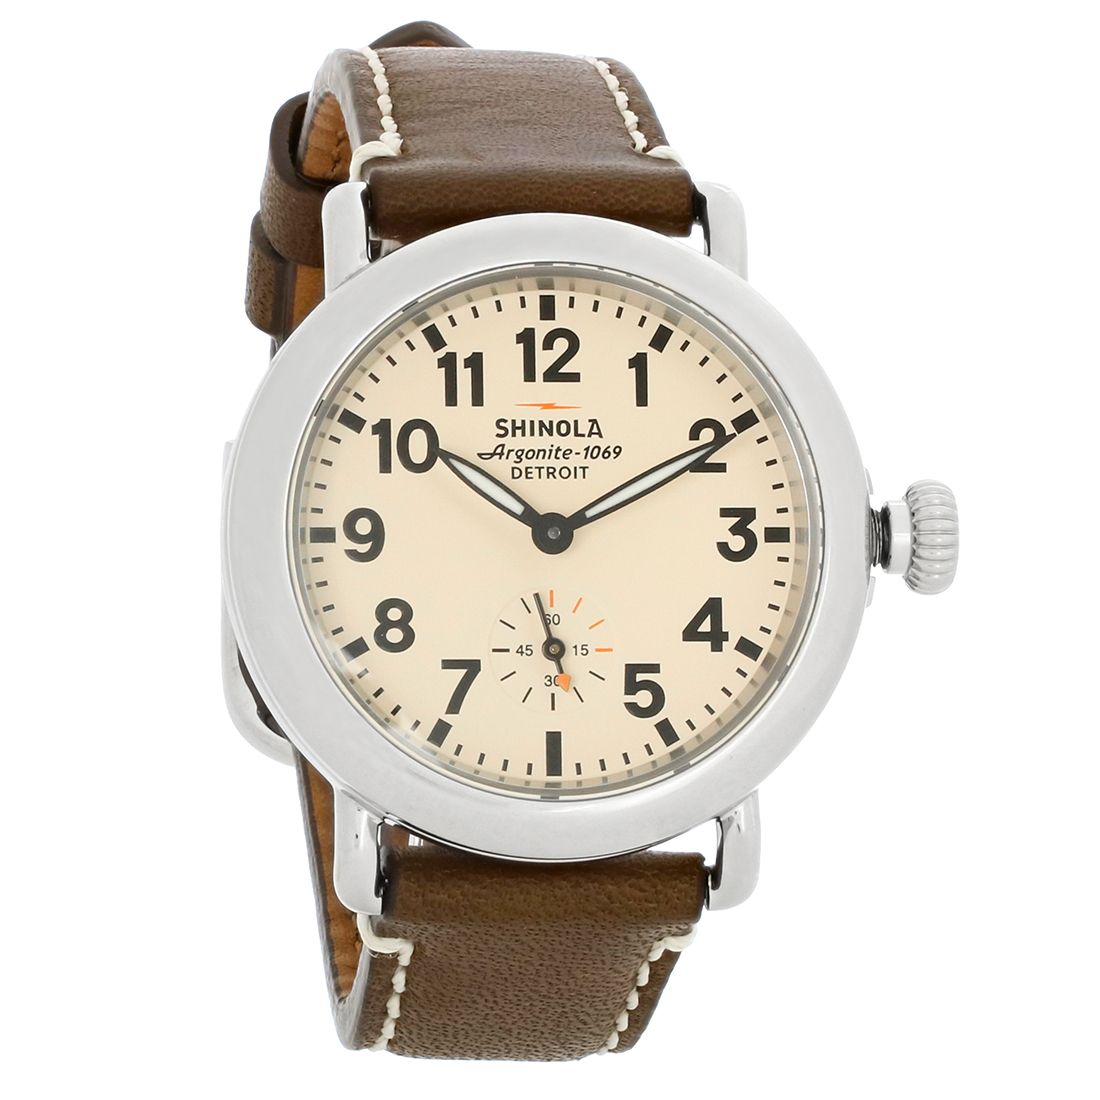 Shinola the runwell ladies argonite 1069 detroit swiss quartz watch 10000253 ebay for Argonite watches